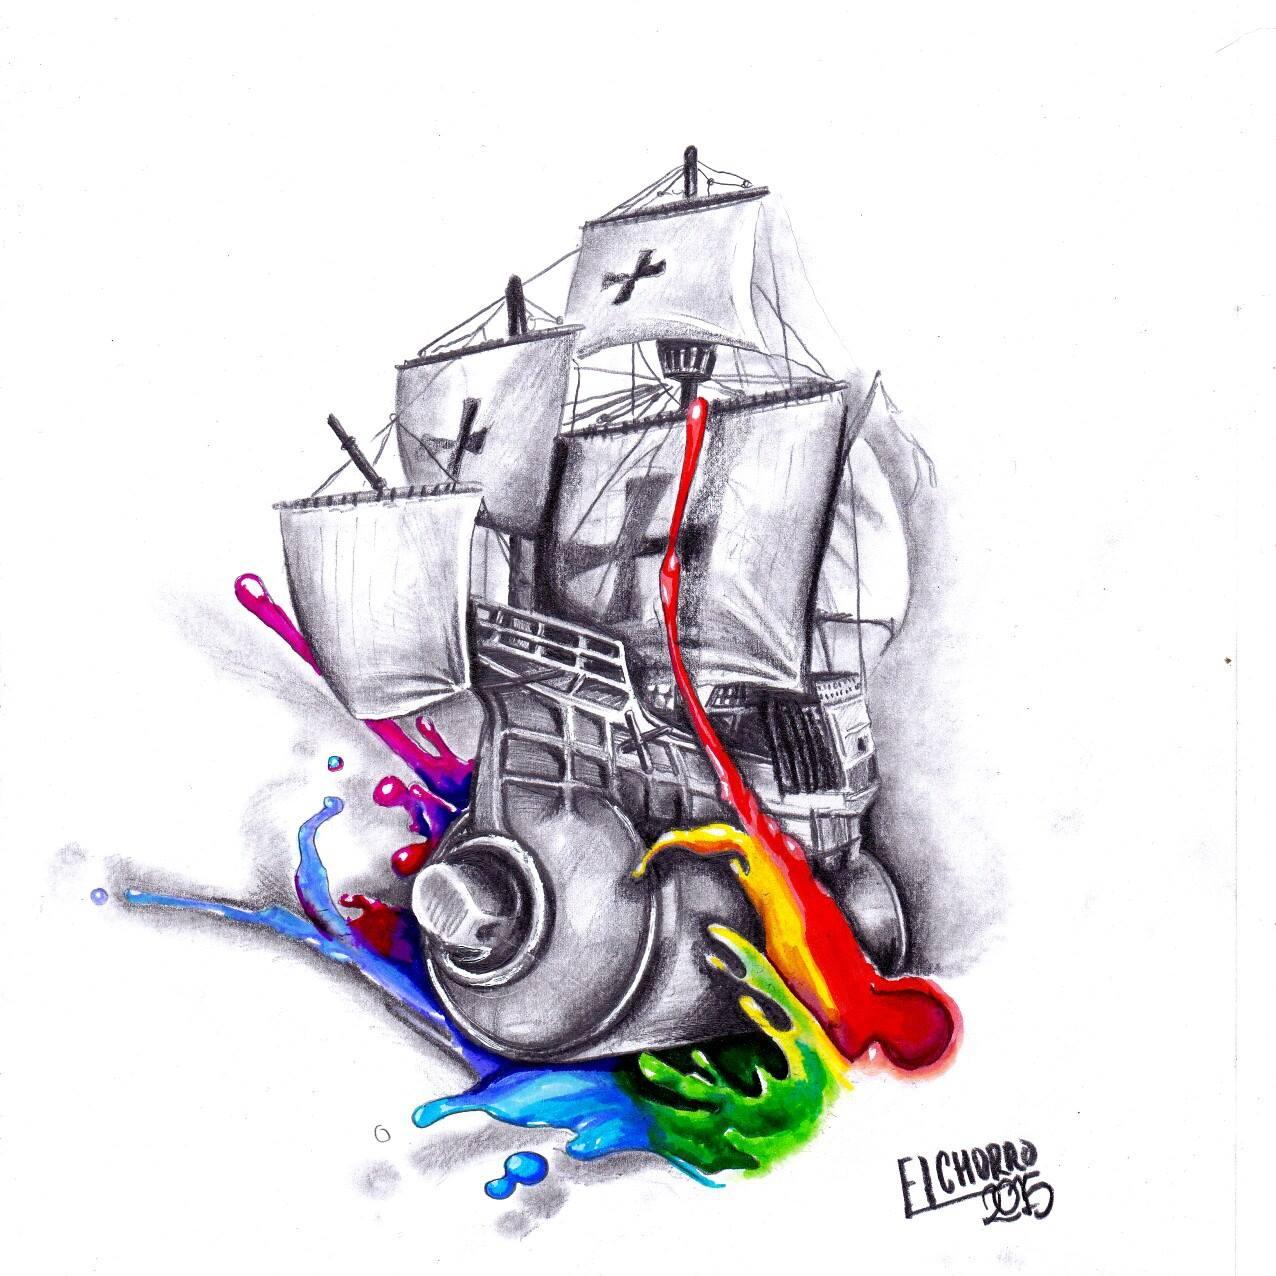 barco vandal spray tattoo graffiti tatuajes palencia watercolor